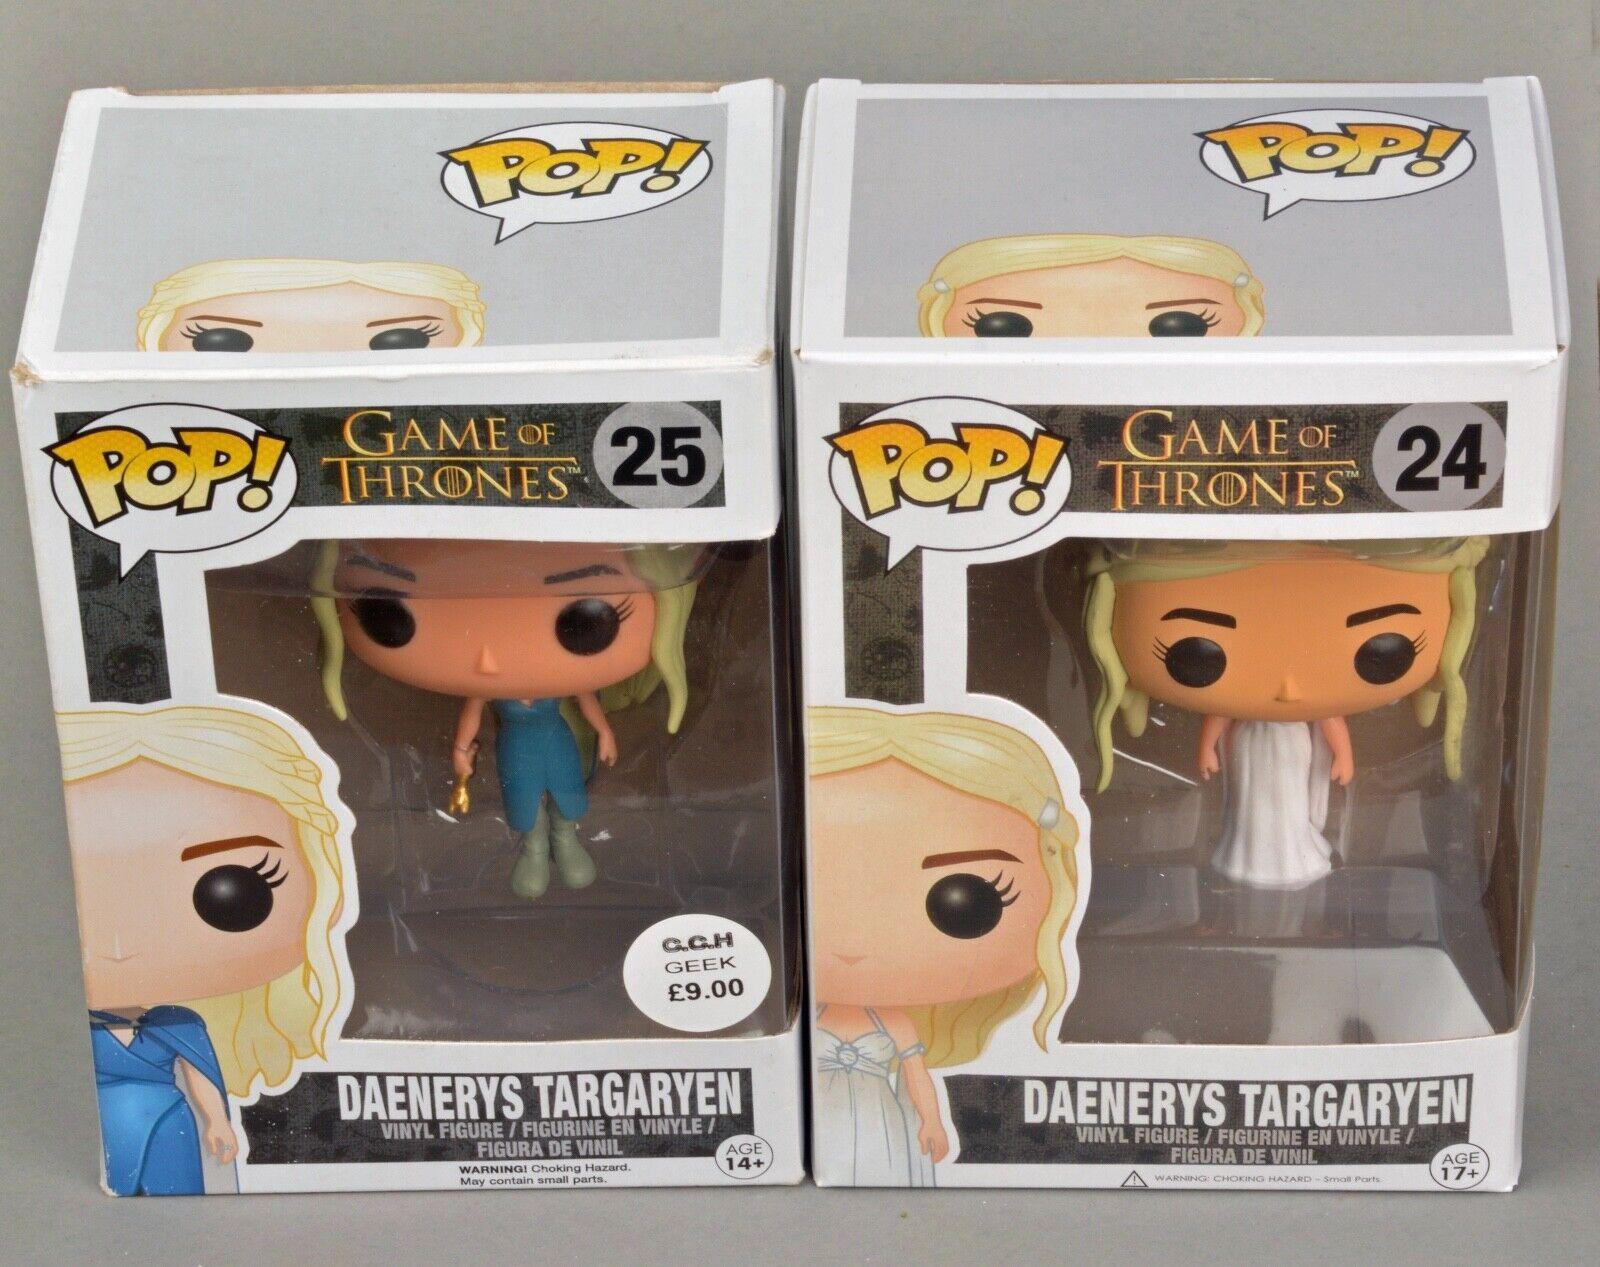 Funko Pop Vinyl Figures  Daenerys Targagyen Game of Thrones   24 and 25